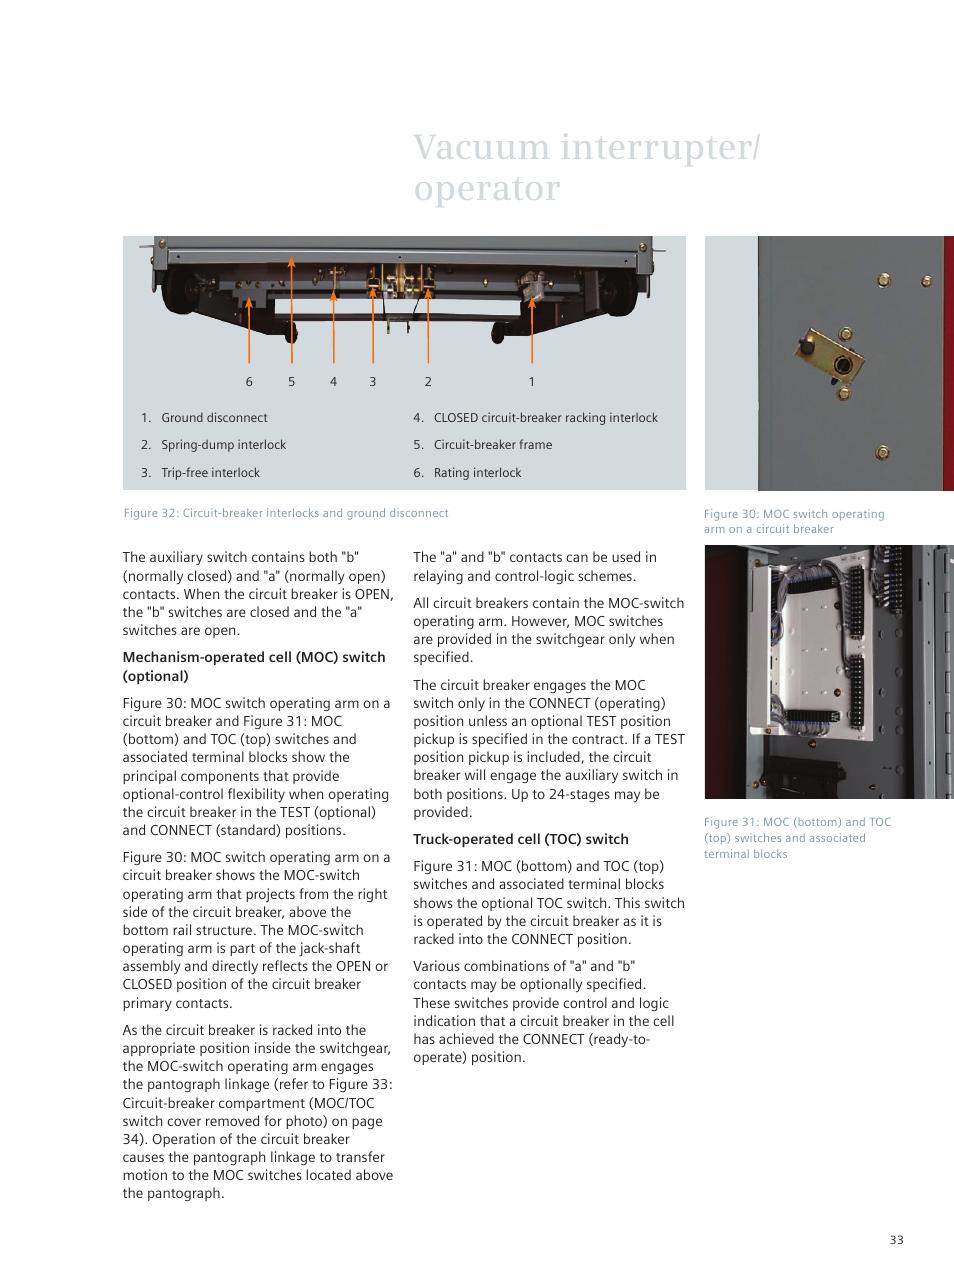 Vacuum Interrupter Operator Siemens Circuit Breaker 38 Photointerruptercircuitpng 3ah3 Kv User Manual